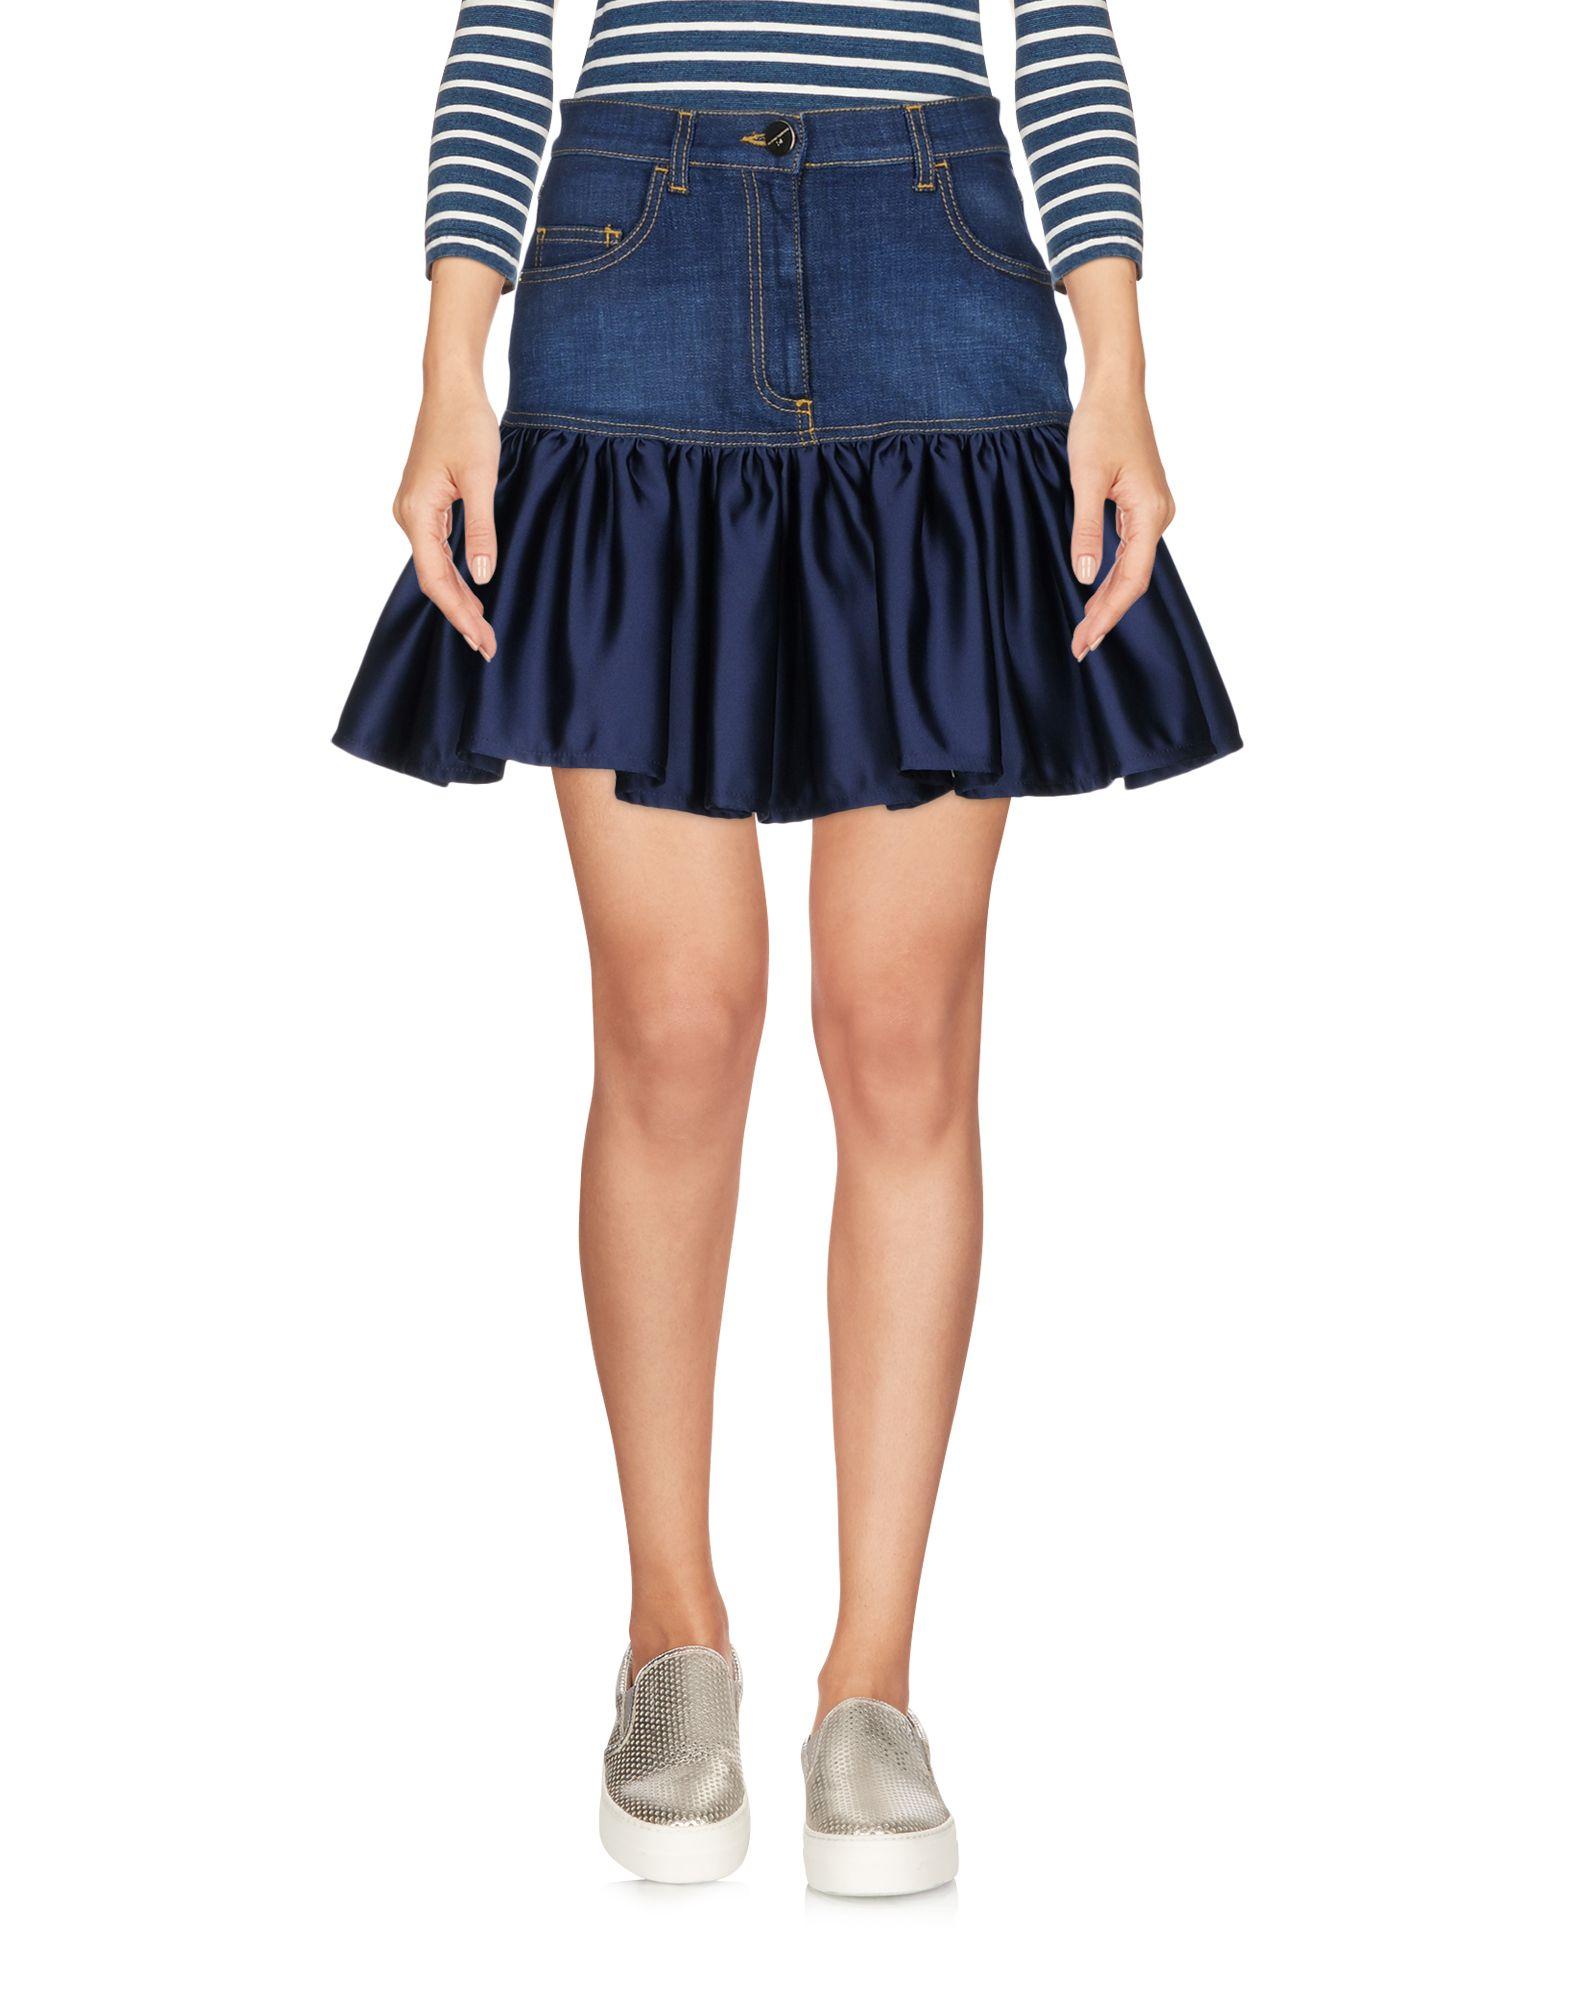 Фото - ELISABETTA FRANCHI JEANS Джинсовая юбка pieces джинсовая юбка